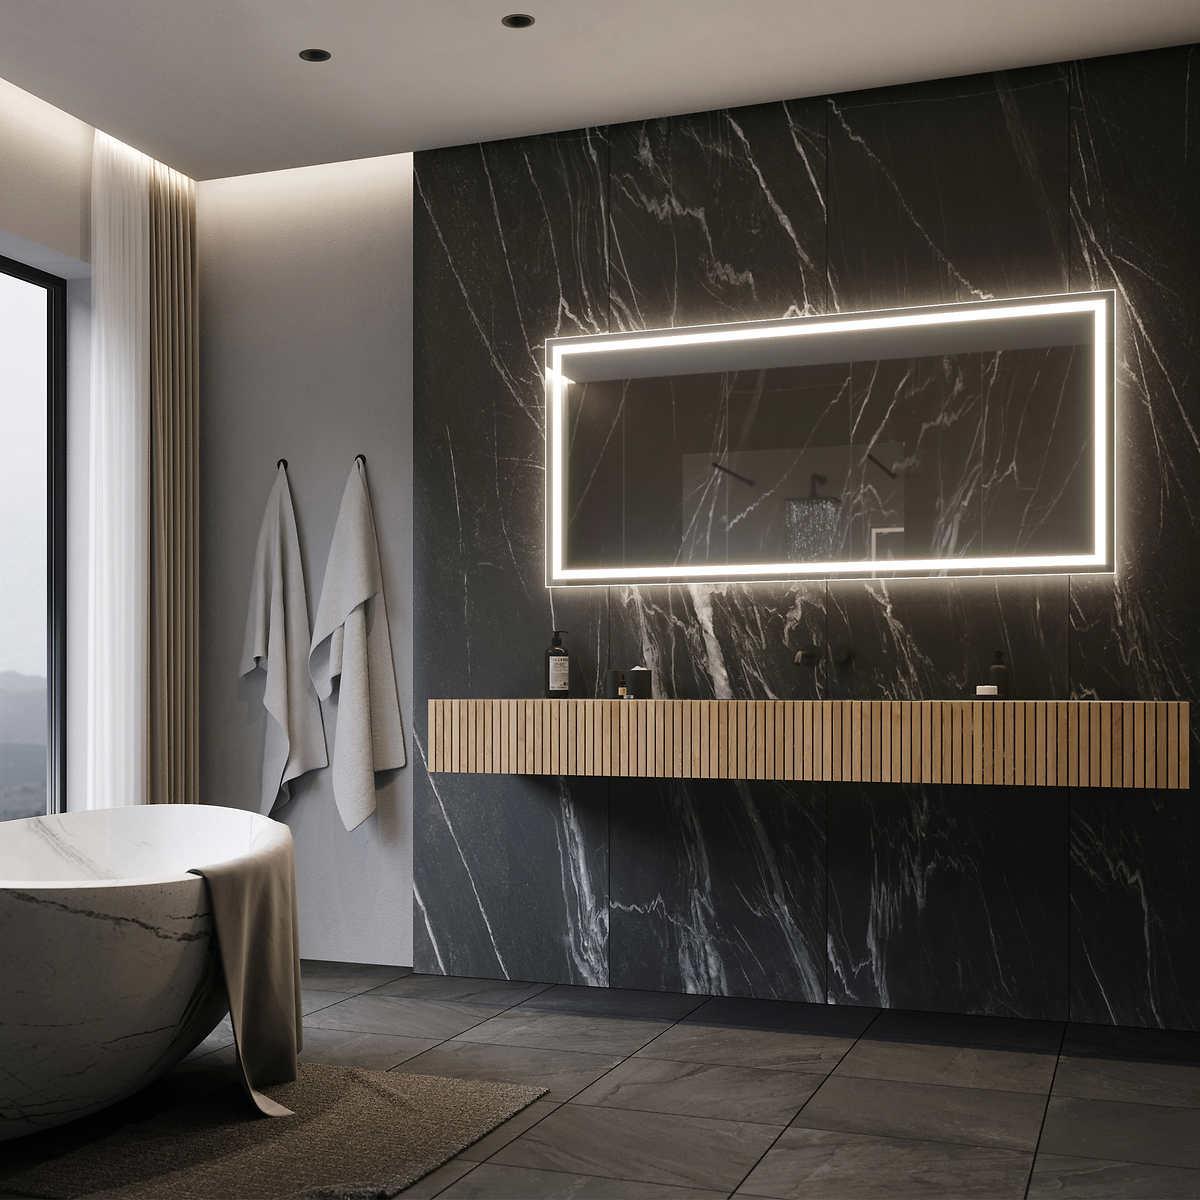 Illuminated Led 28 X 60 Bathroom Mirror By Suite Mirror